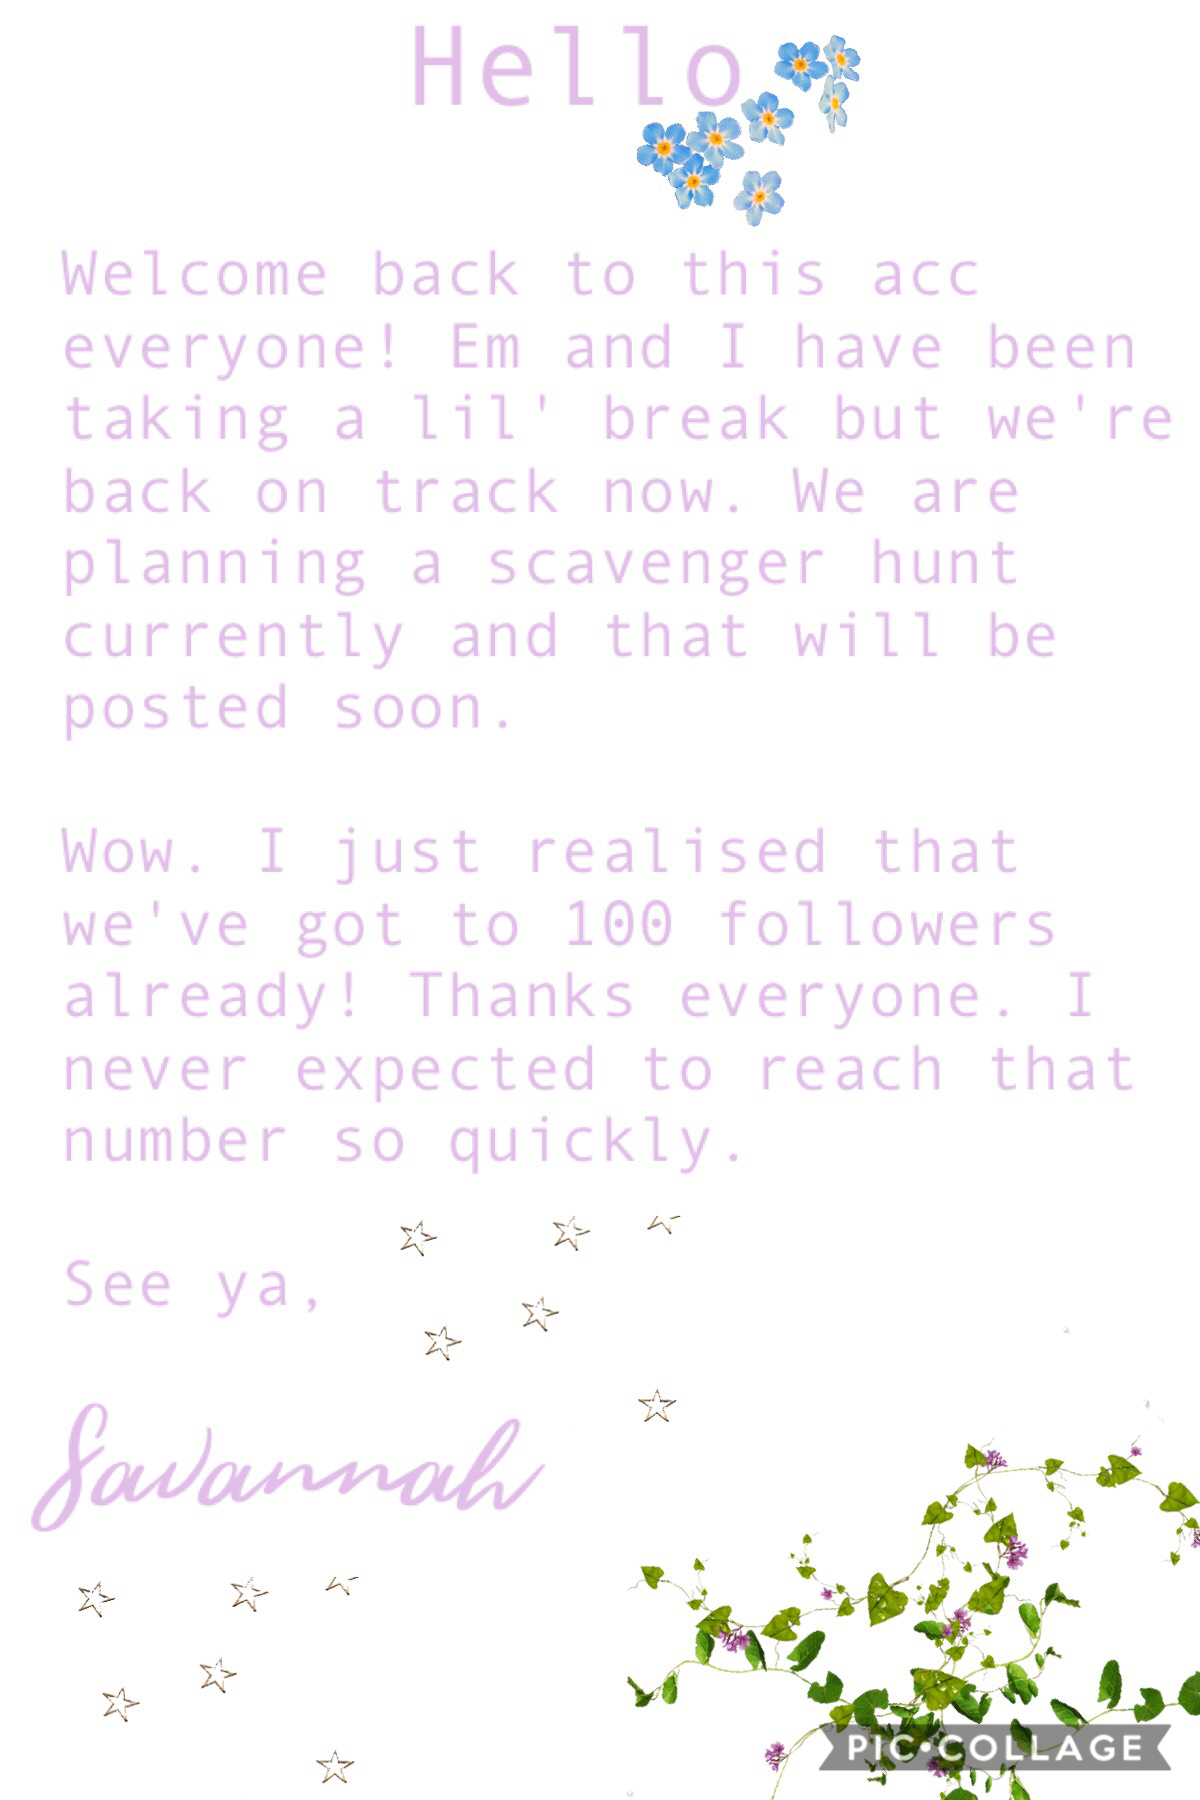 hi everyone ⚡️ em + I took a little break but we're back now// sav 🍃